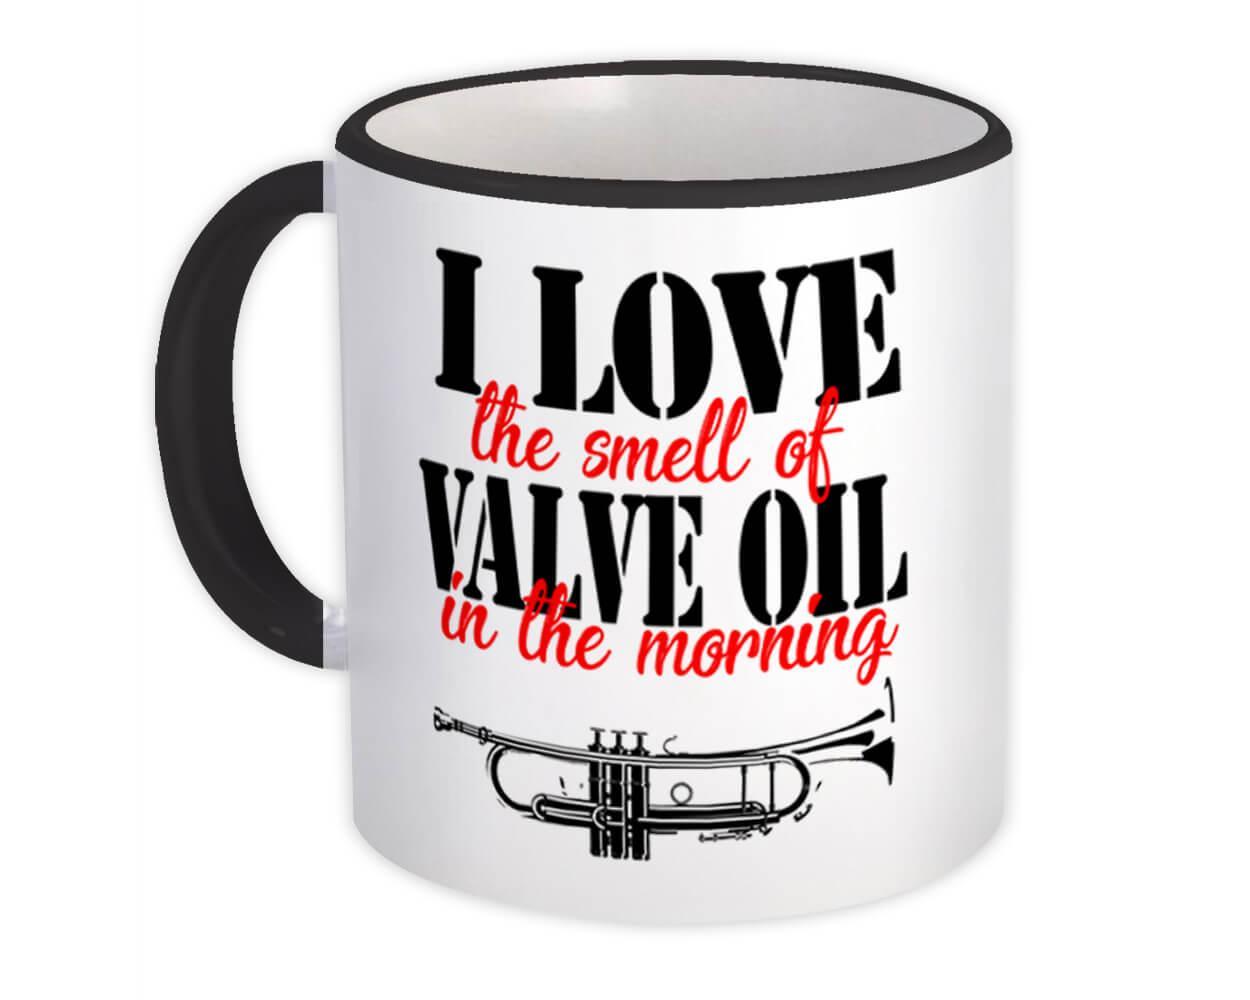 Love the Smell of Valve oil : Gift Mug Trumpet Music Musician Band